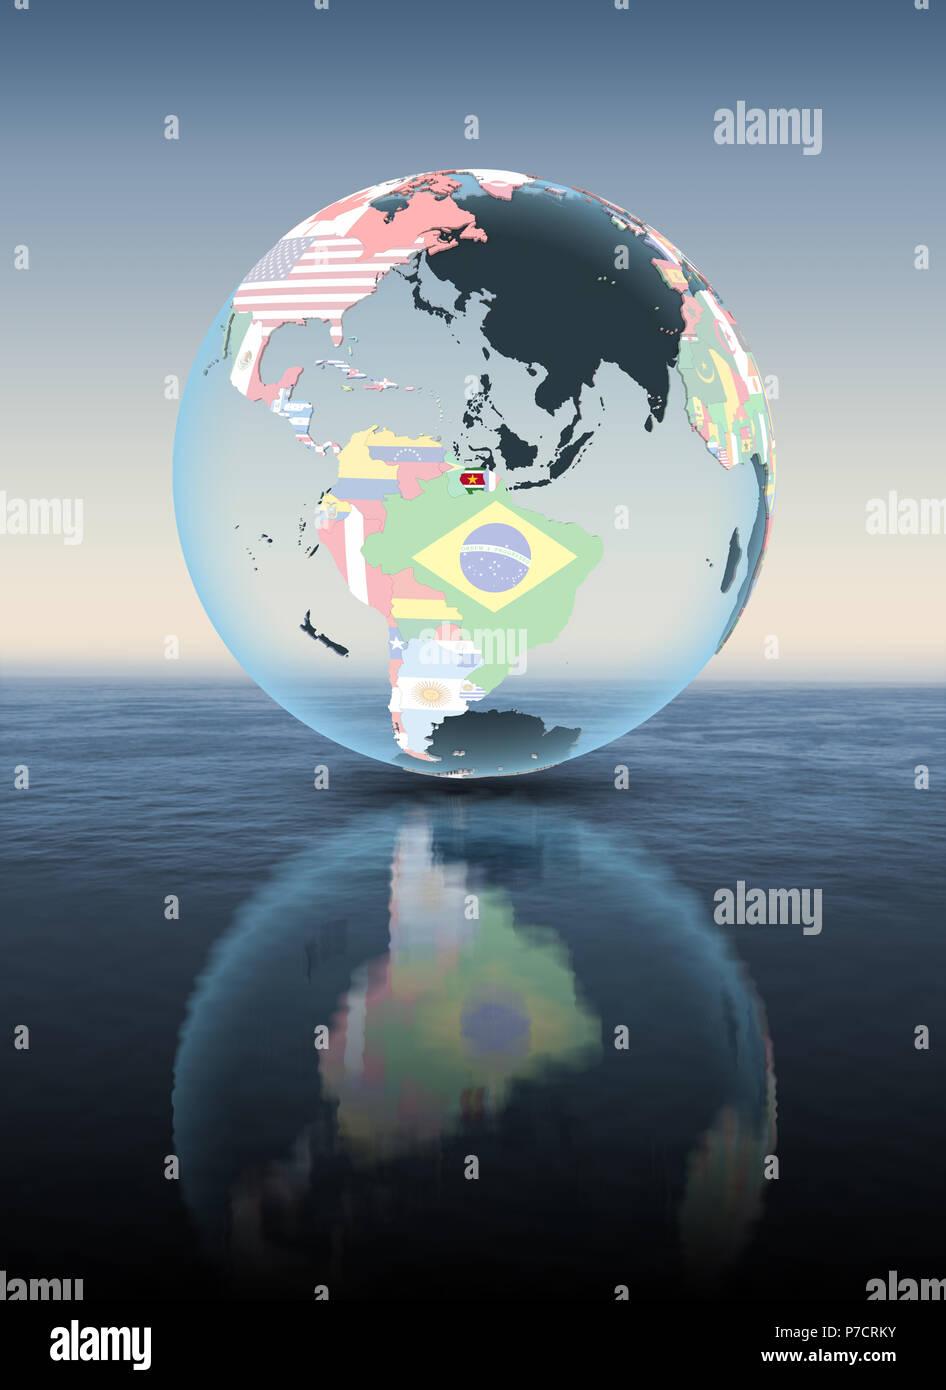 Suriname on political globe floating above water. 3D illustration. - Stock Image